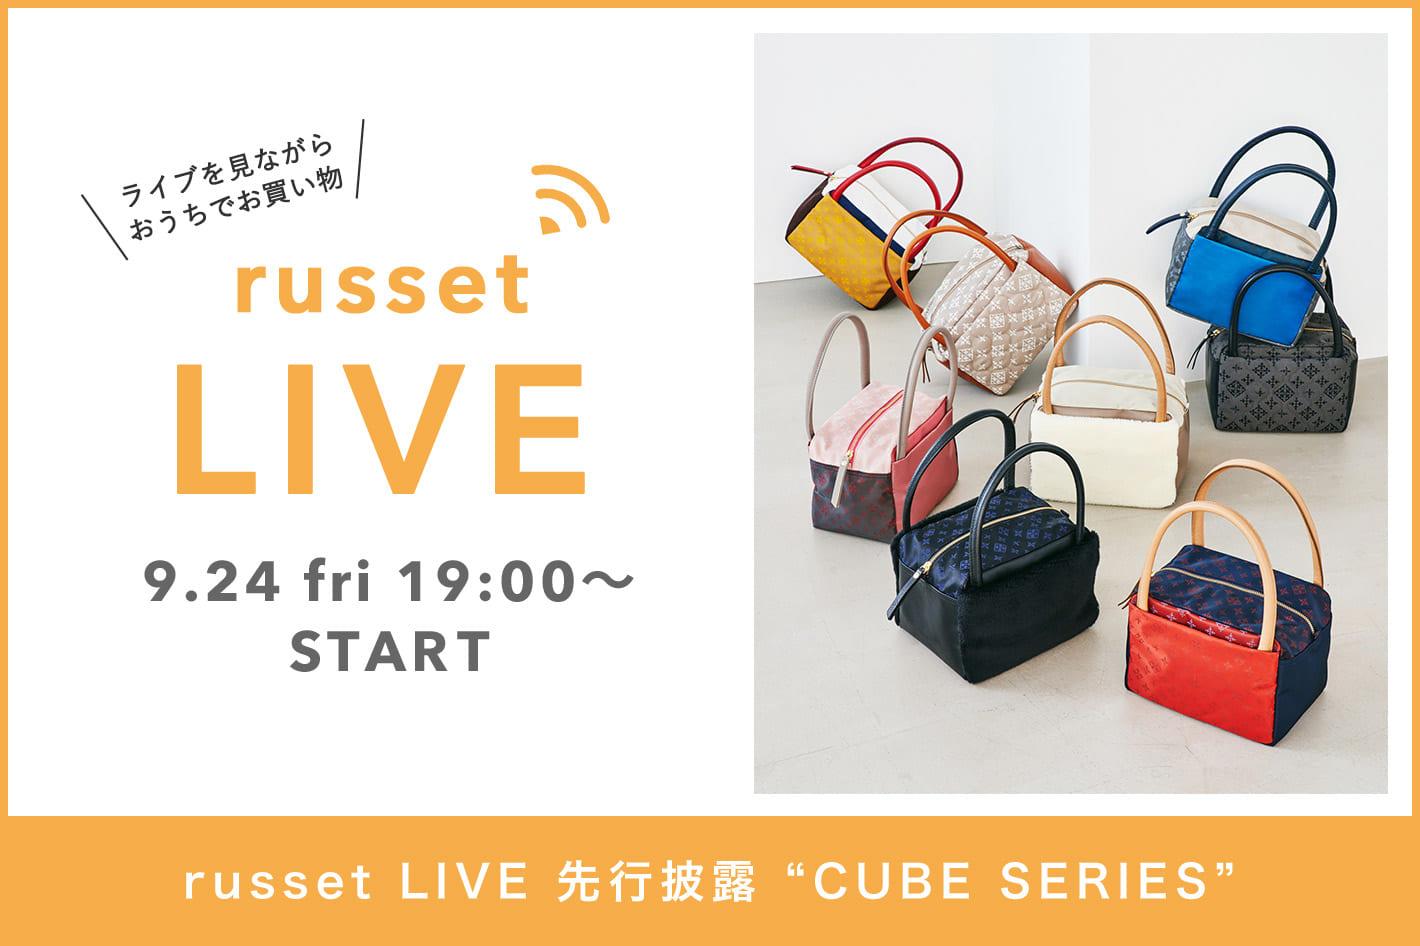 russet ライブコマース≪russet LIVE≫9/24 19:00~生配信スタート!